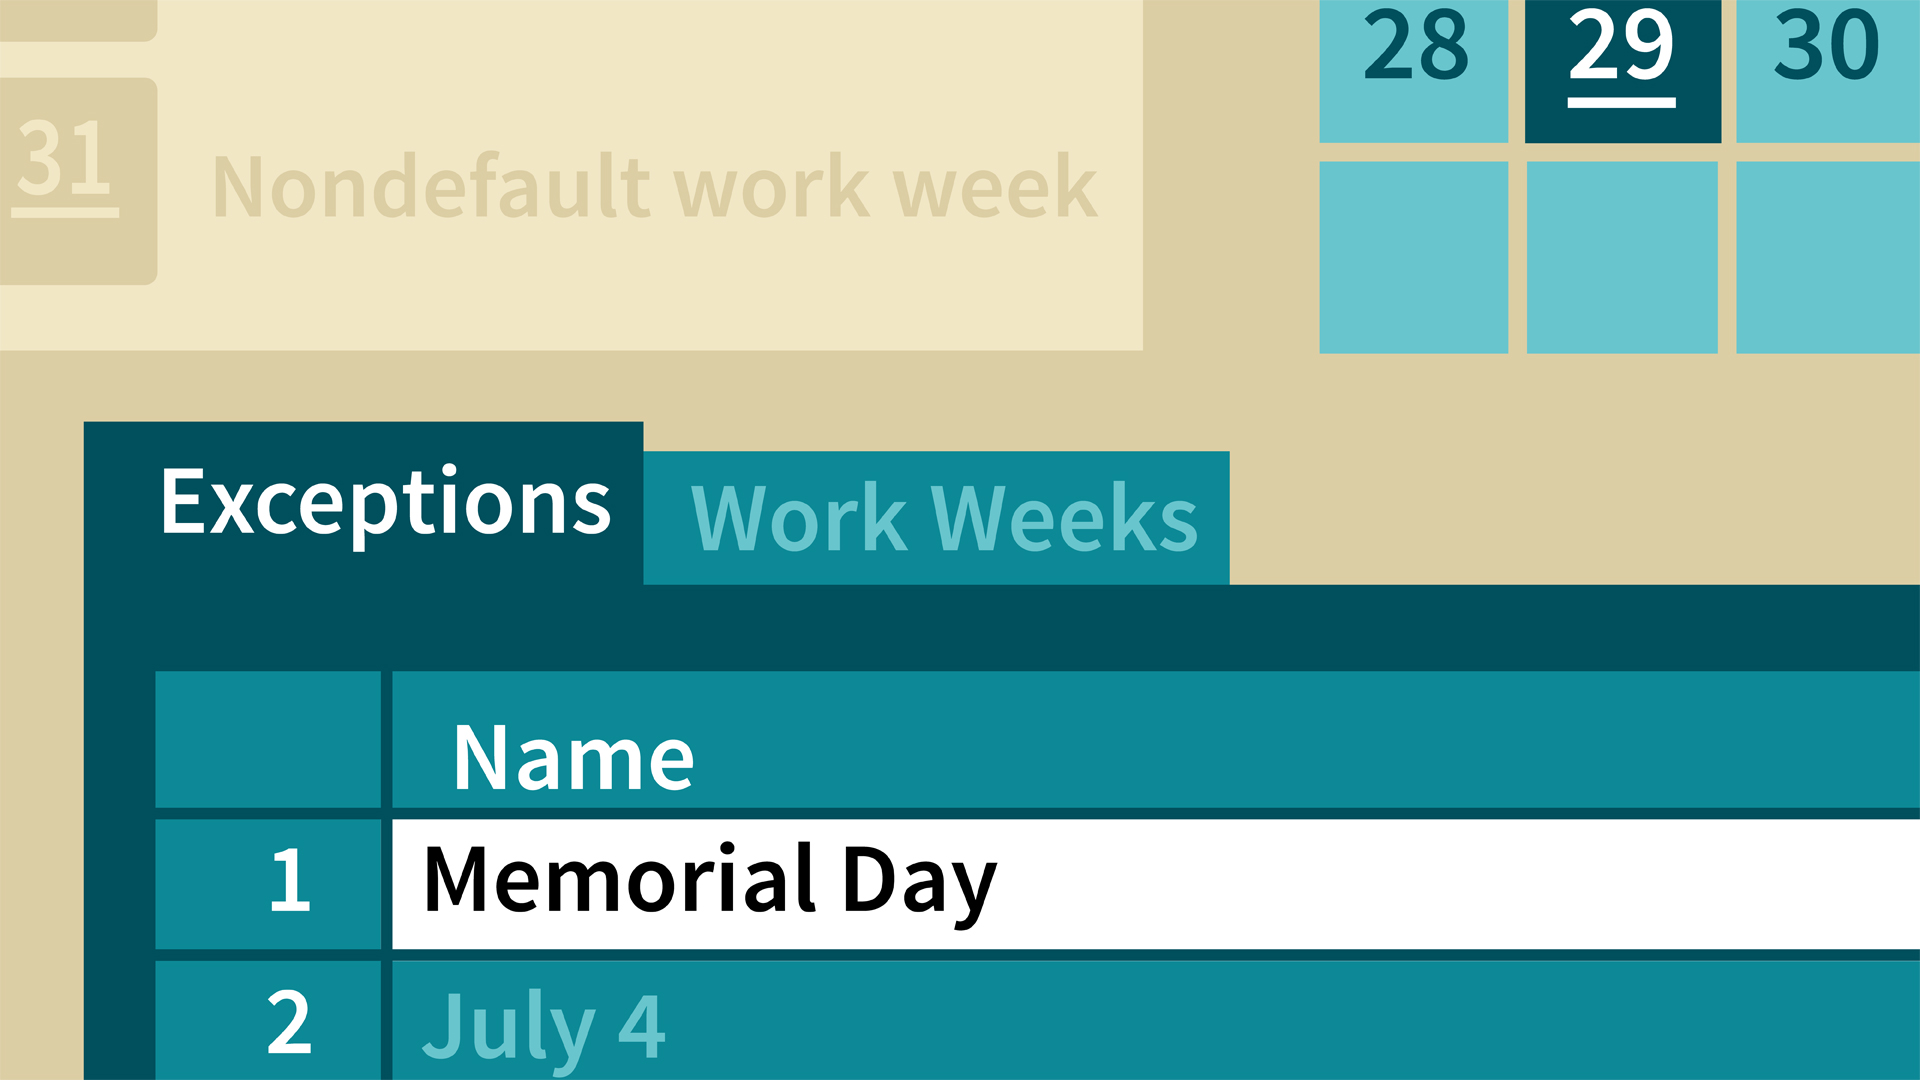 Create a calendar for a two-week work schedule